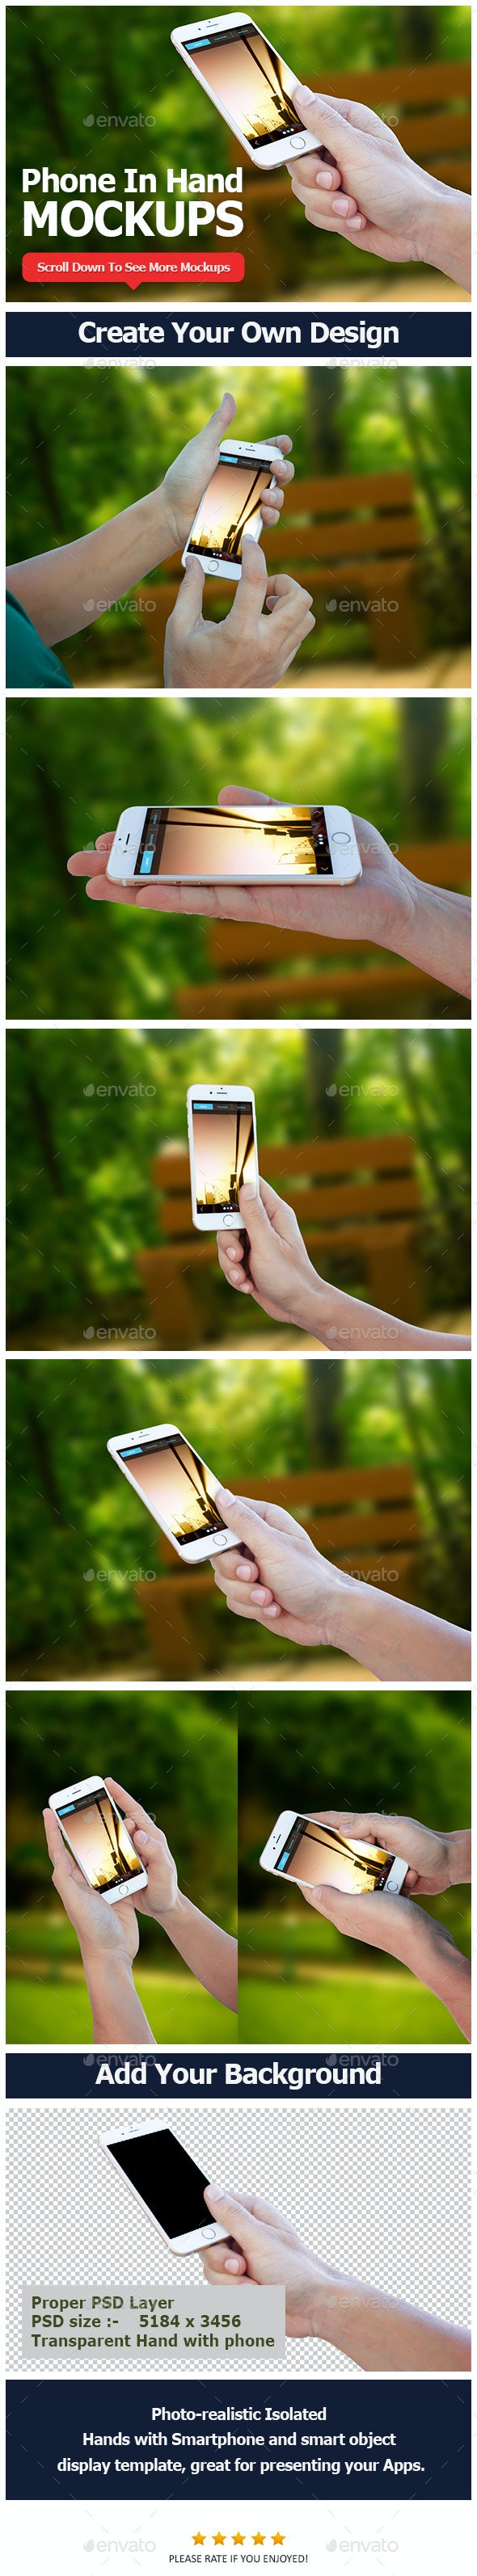 Smartphone in Hand Mockup Vol 2 - Mobile Displays